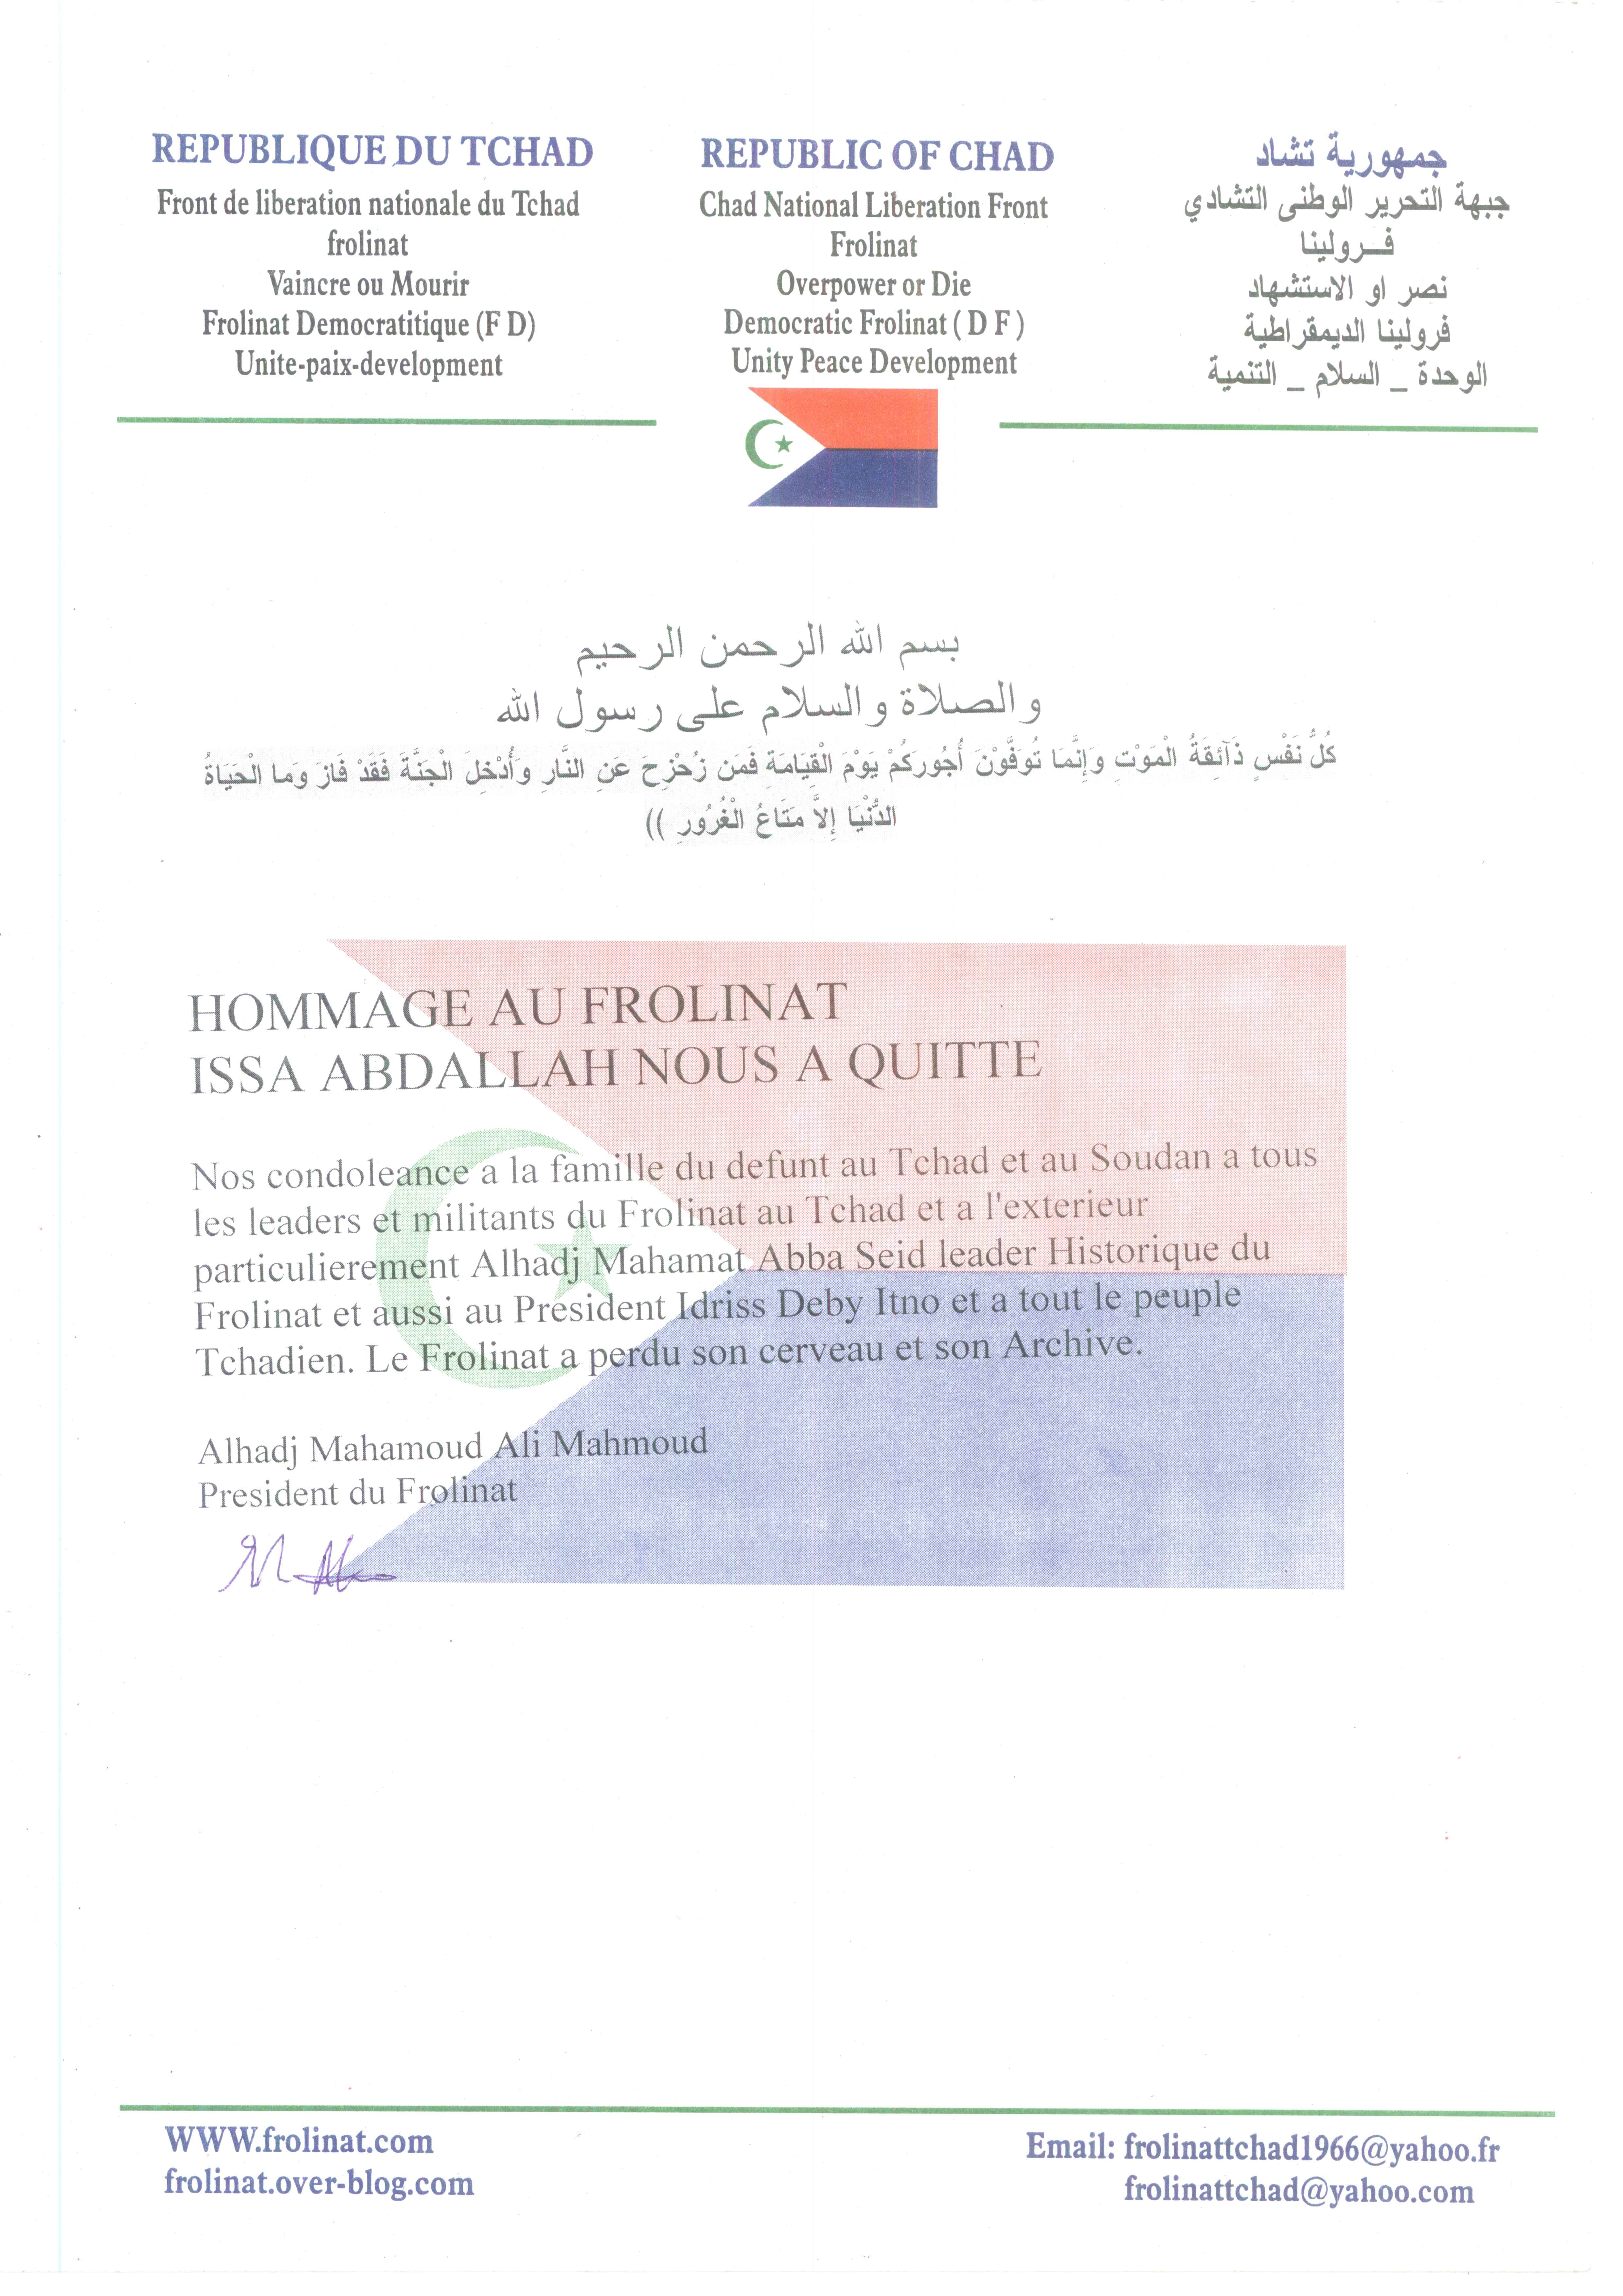 Tchad : Le FROLINAT rend hommage à Issa Abdallah